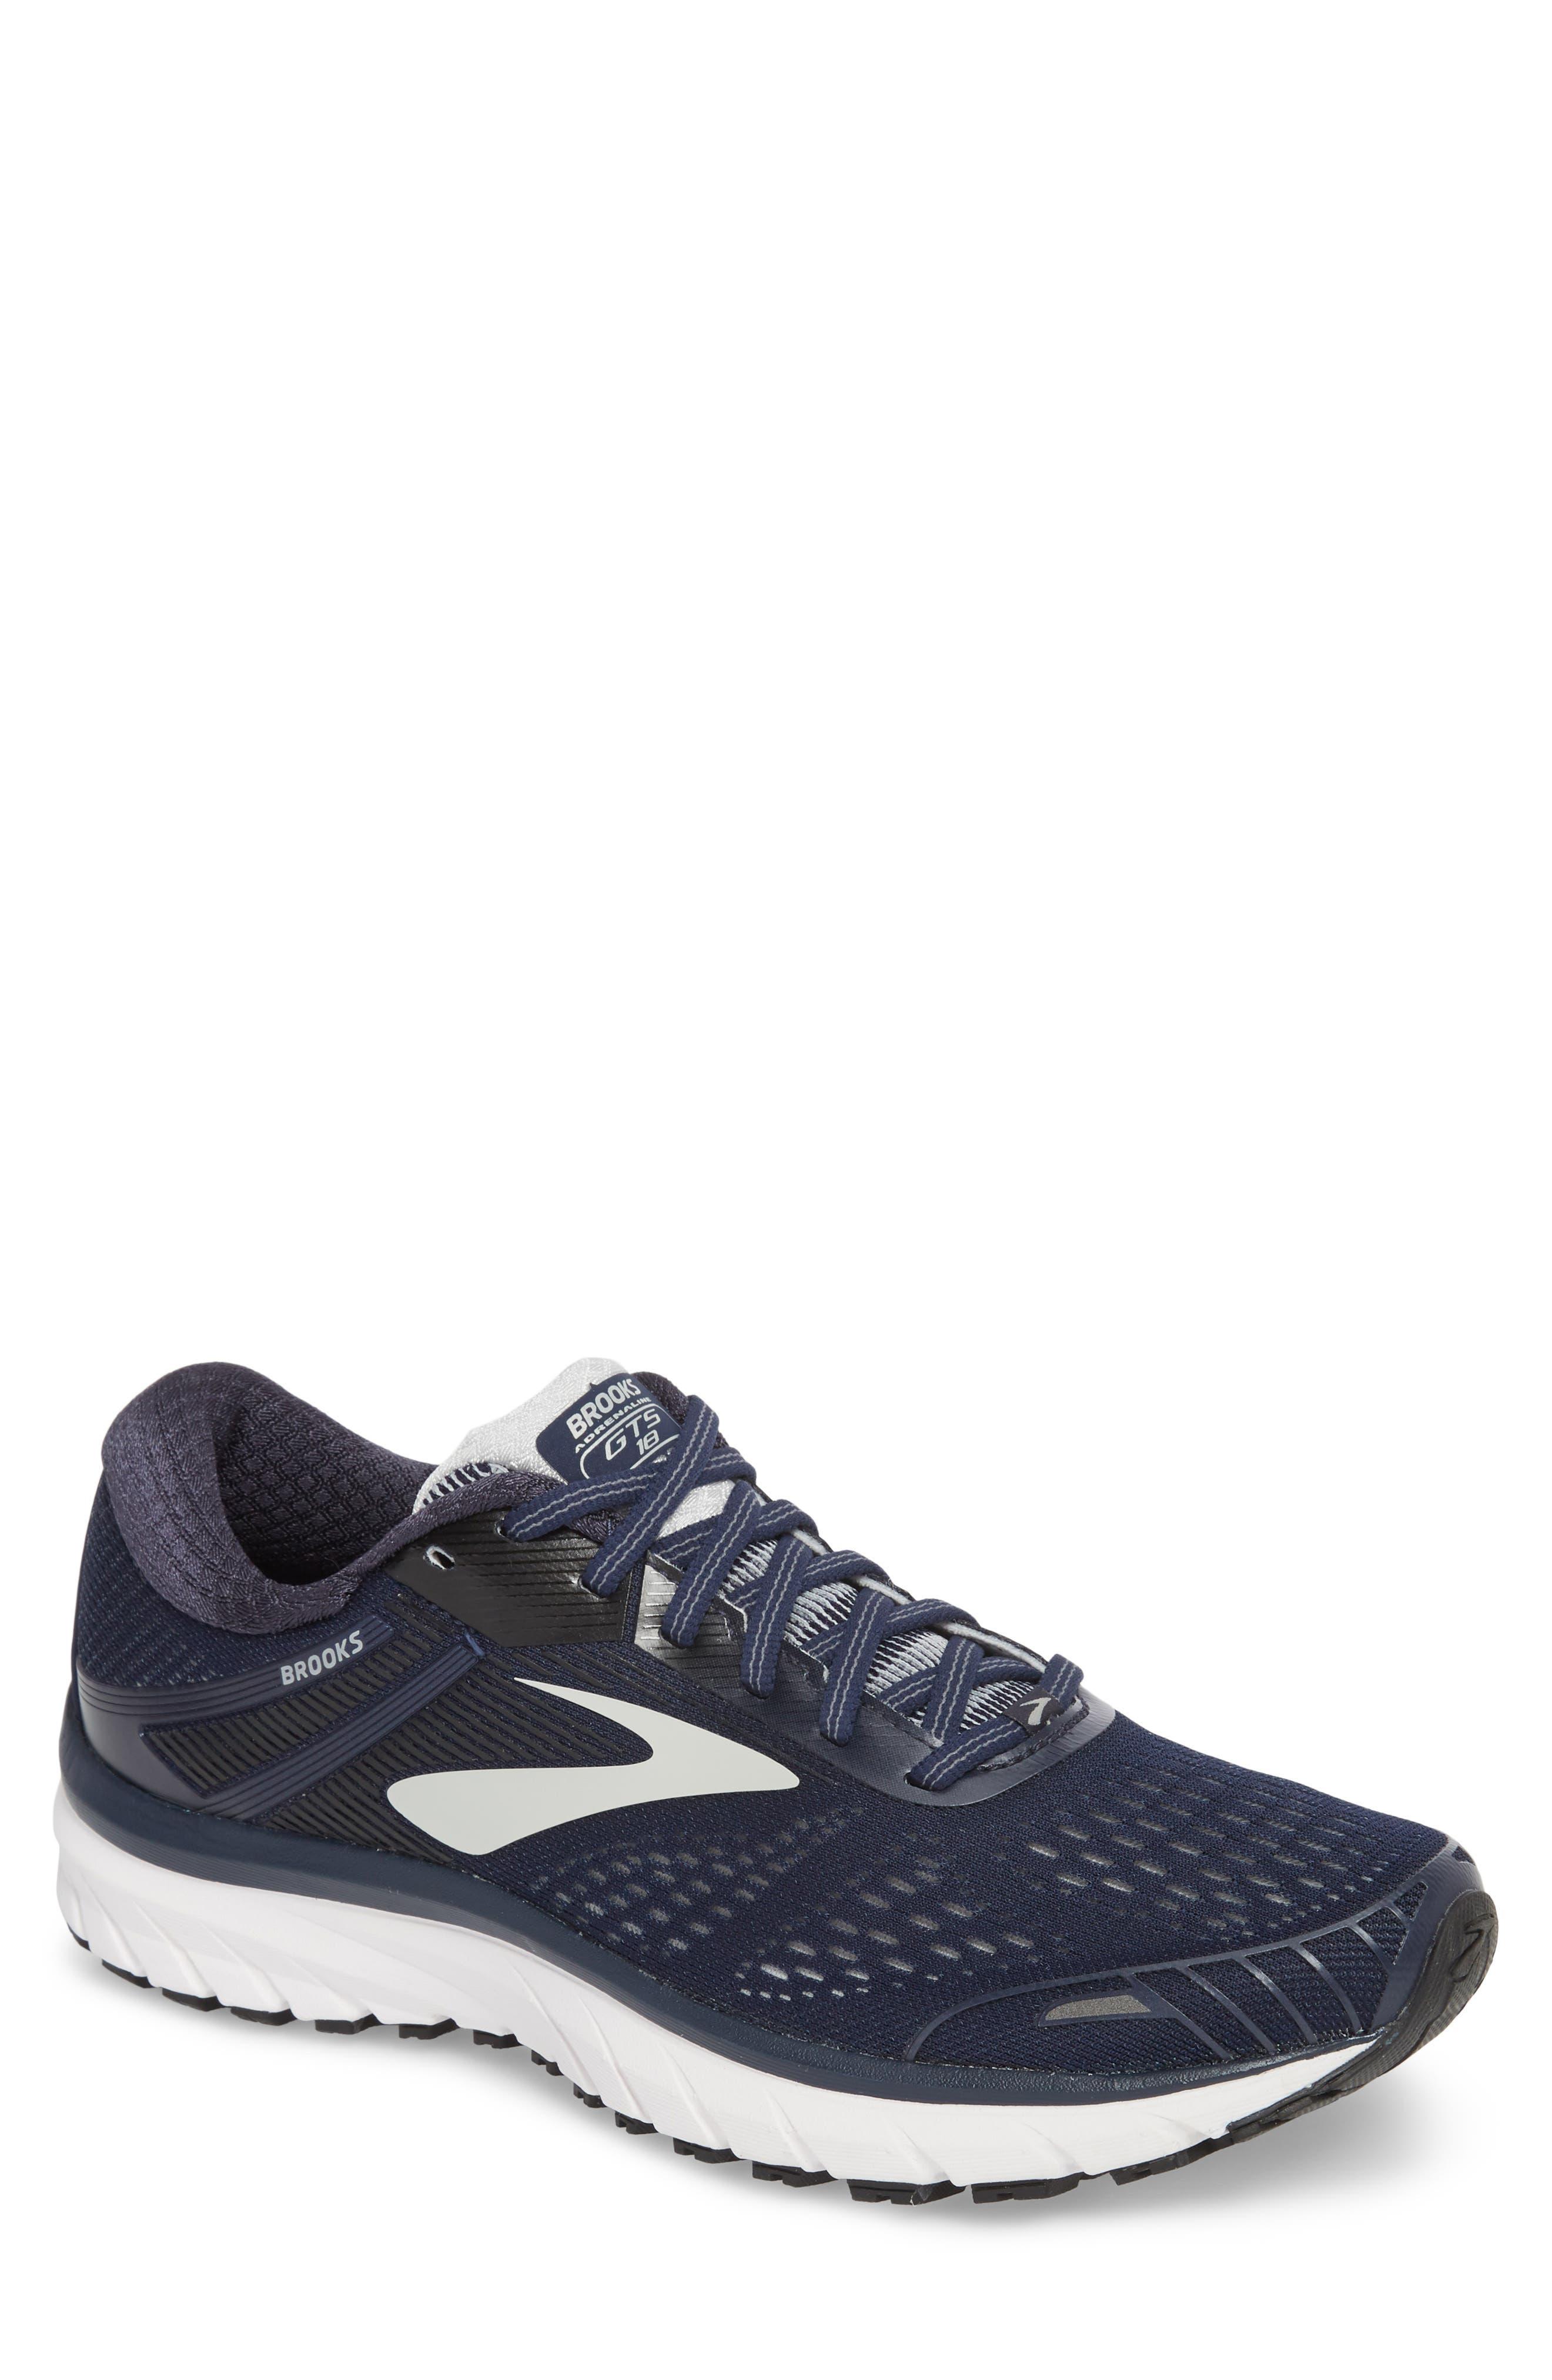 Adrenaline GTS 18 Running Shoe,                         Main,                         color, Navy/ Grey/ Black